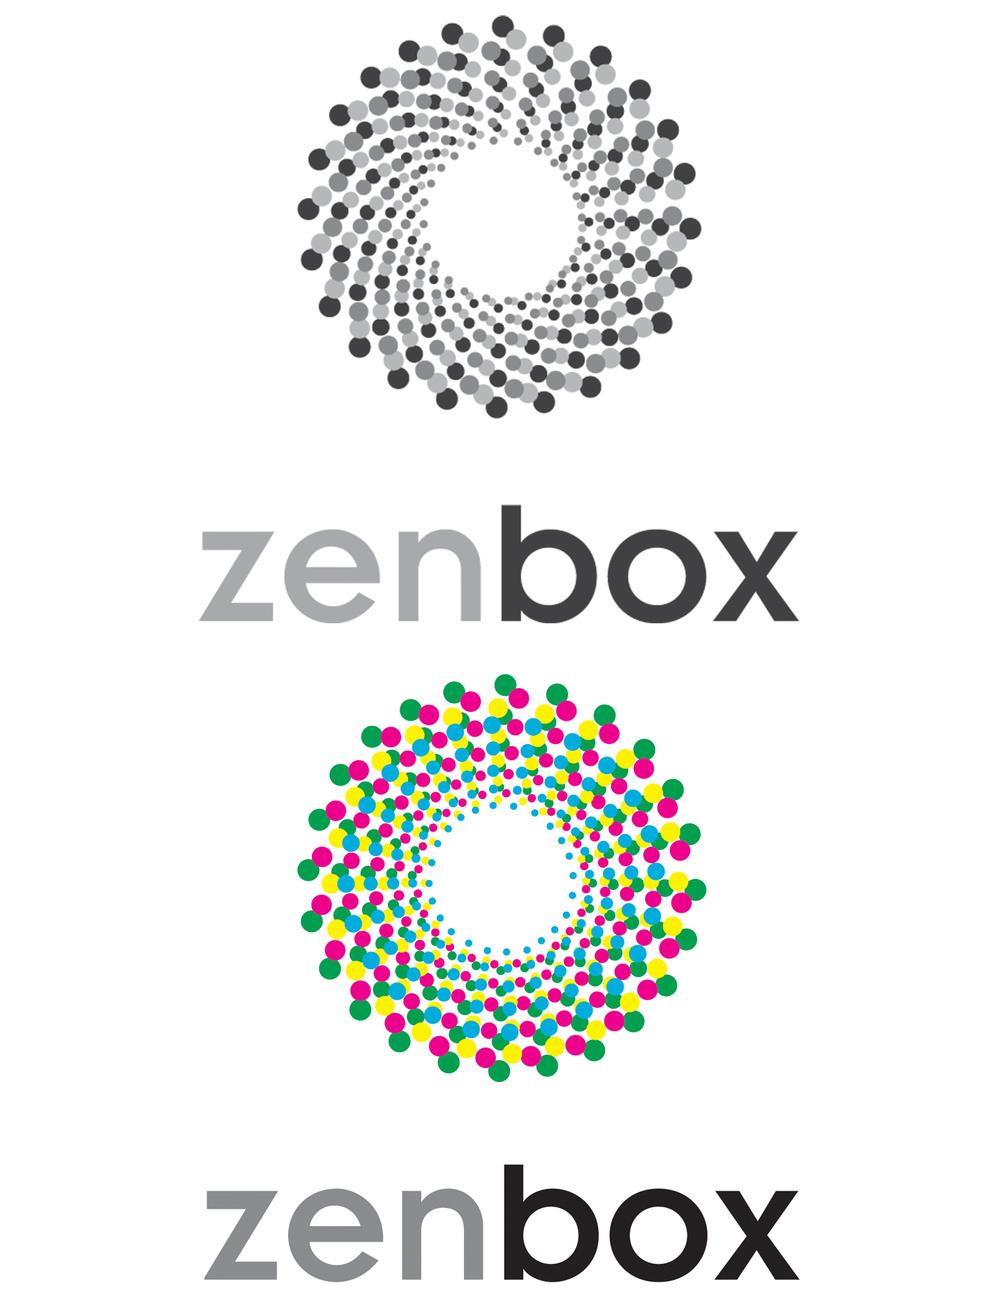 zenbox